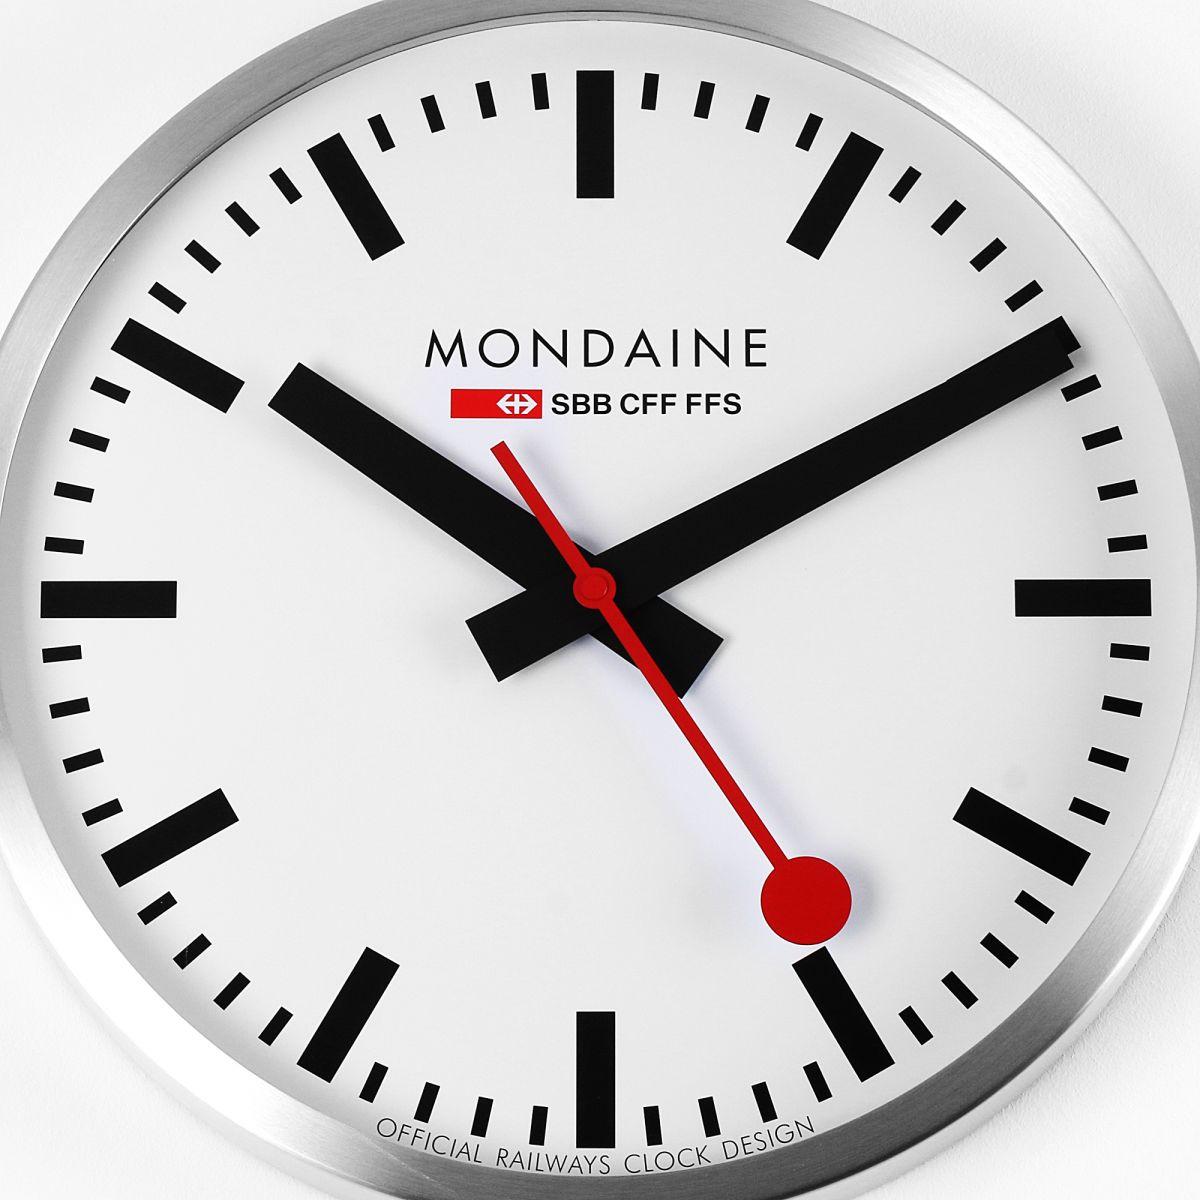 wanduhr mondaine schweizer railways gro wall clock uhren a995. Black Bedroom Furniture Sets. Home Design Ideas